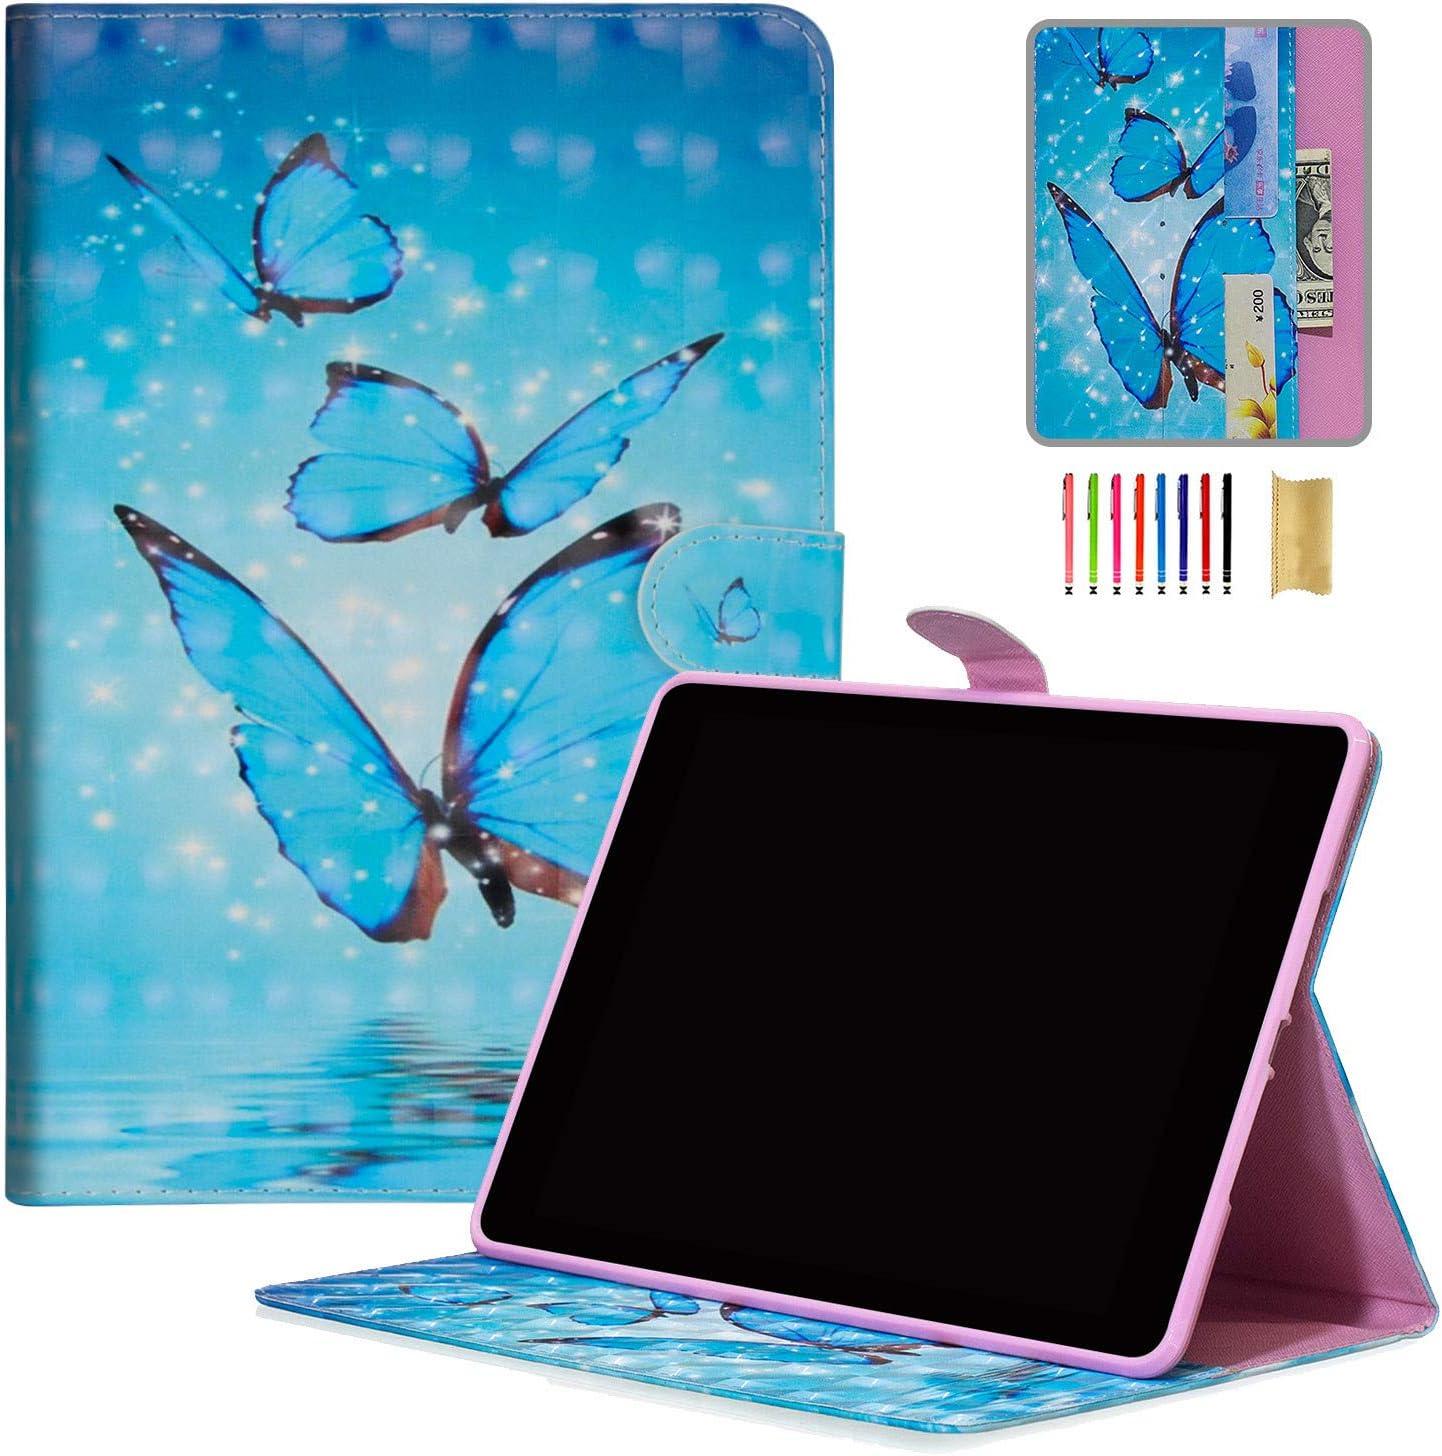 APOLL Case for Memphis Mall iPad 8 7 10.2-Inch 2020 G Oklahoma City Mall 8th 7th Model 2019